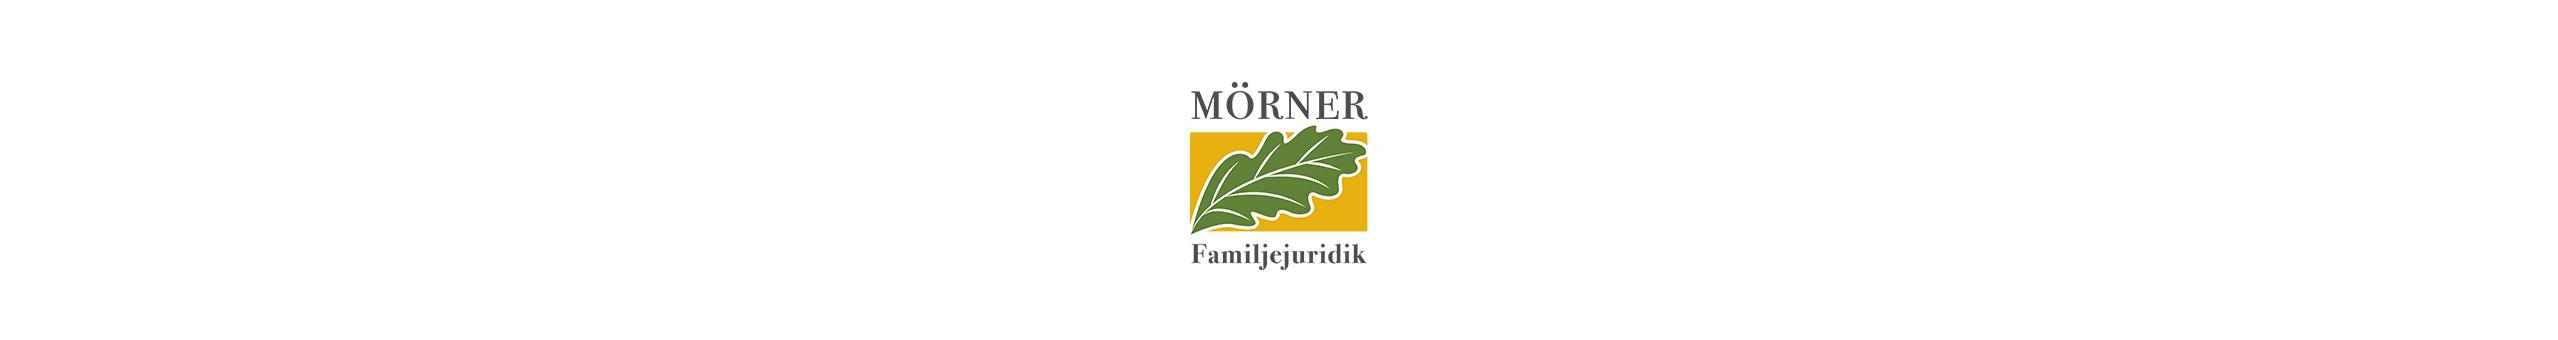 Mörner logga webbsida_vit